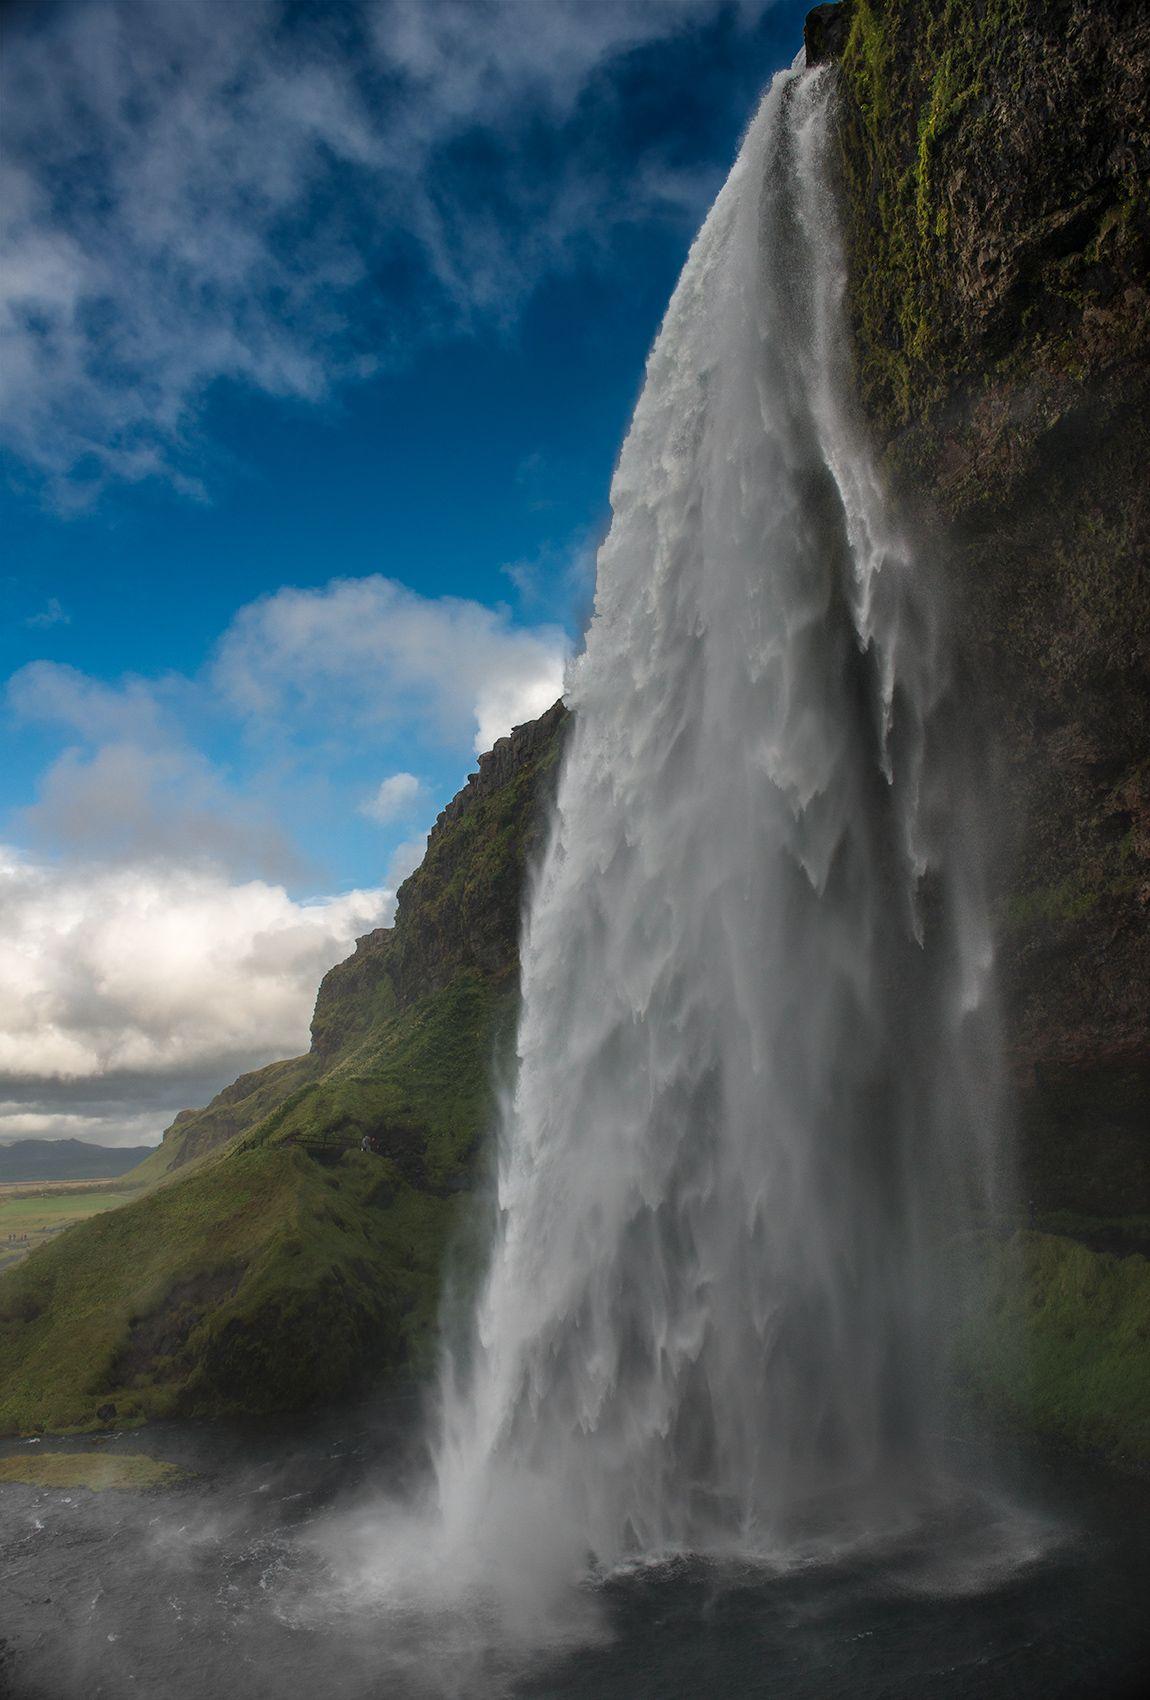 Iceland-09-D-15-09-09-4585-version-2-(Seljalandsfoss).jpg